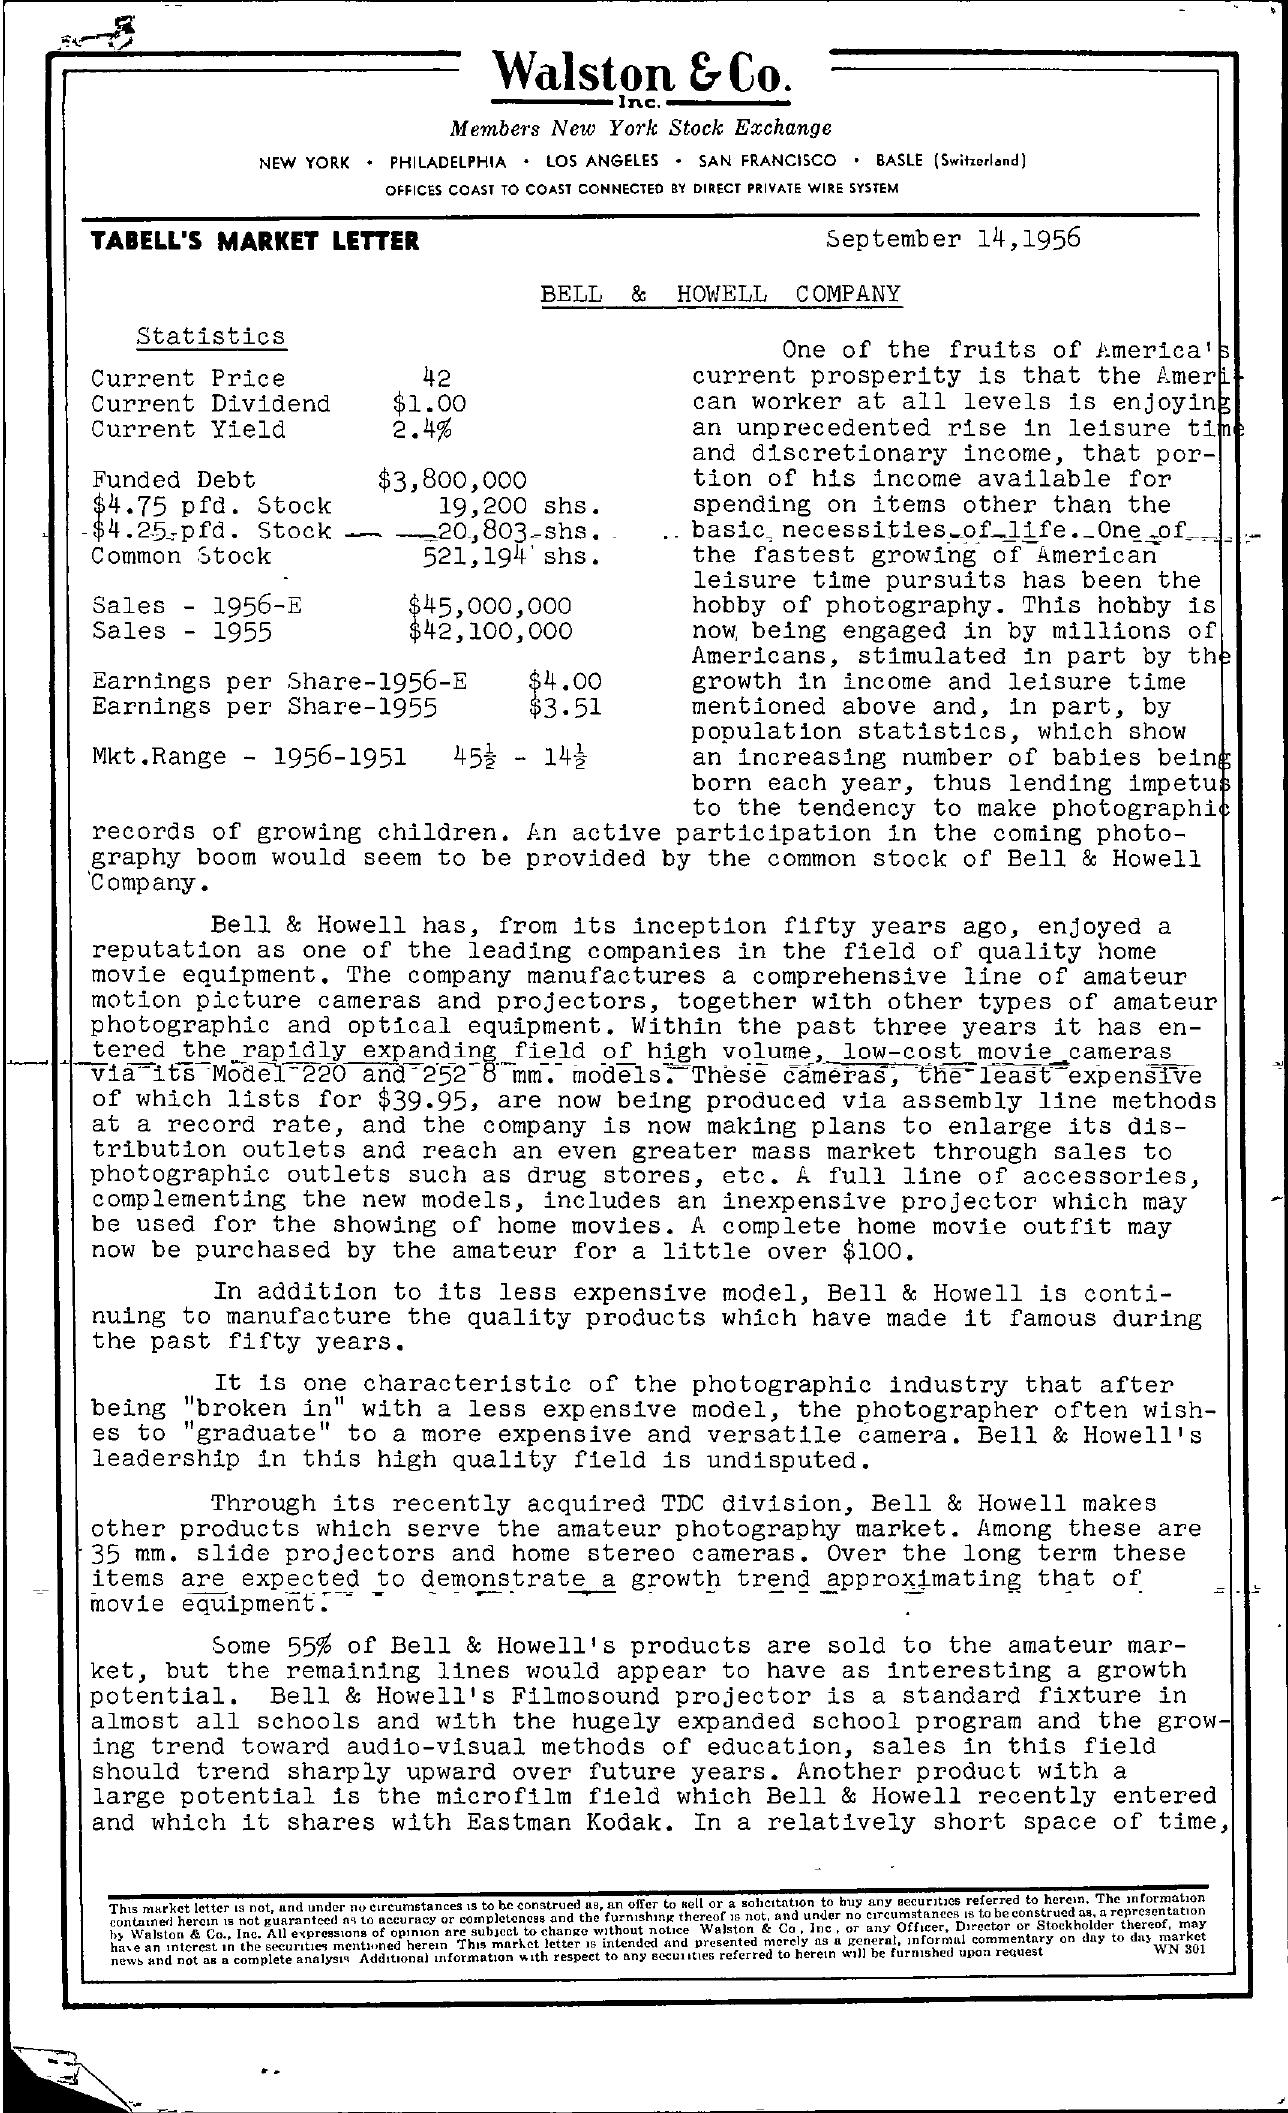 Tabell's Market Letter - September 14, 1956 page 1